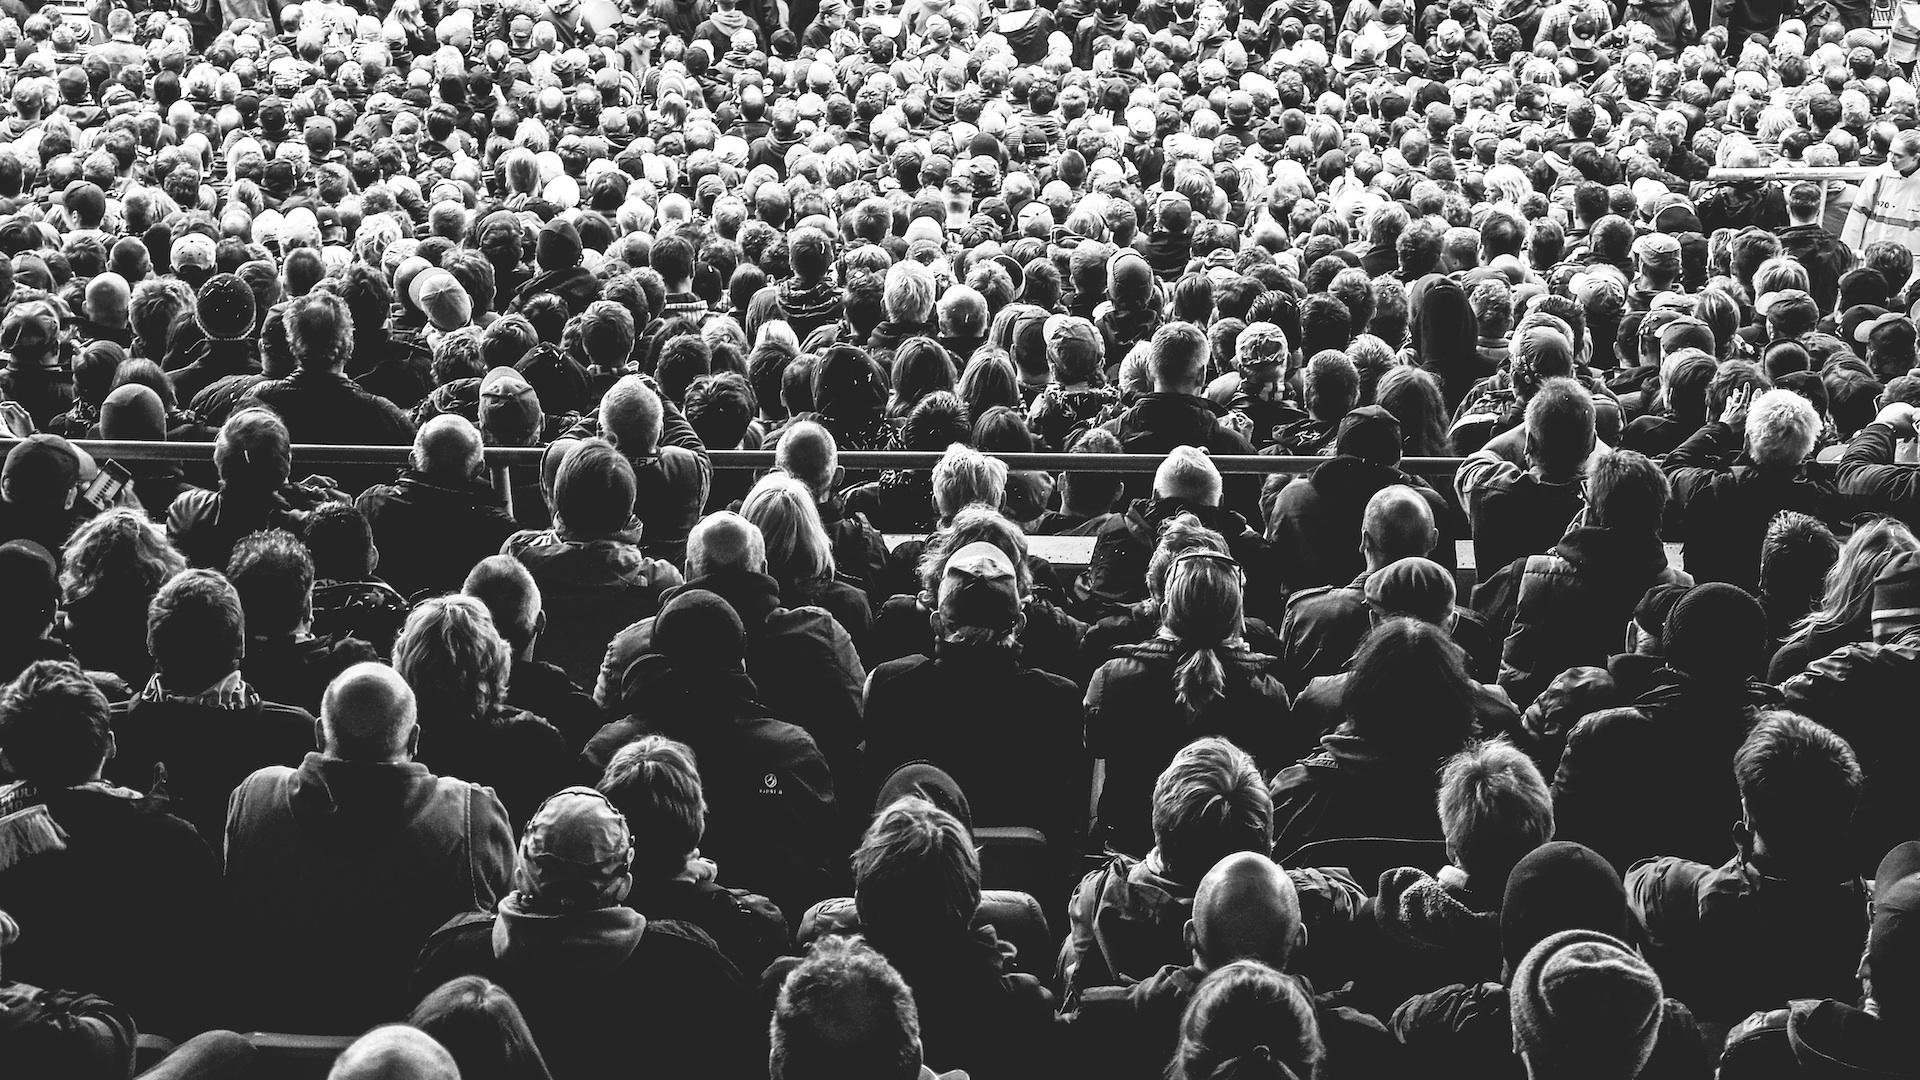 Crowd of Peoople Sitting.jpeg